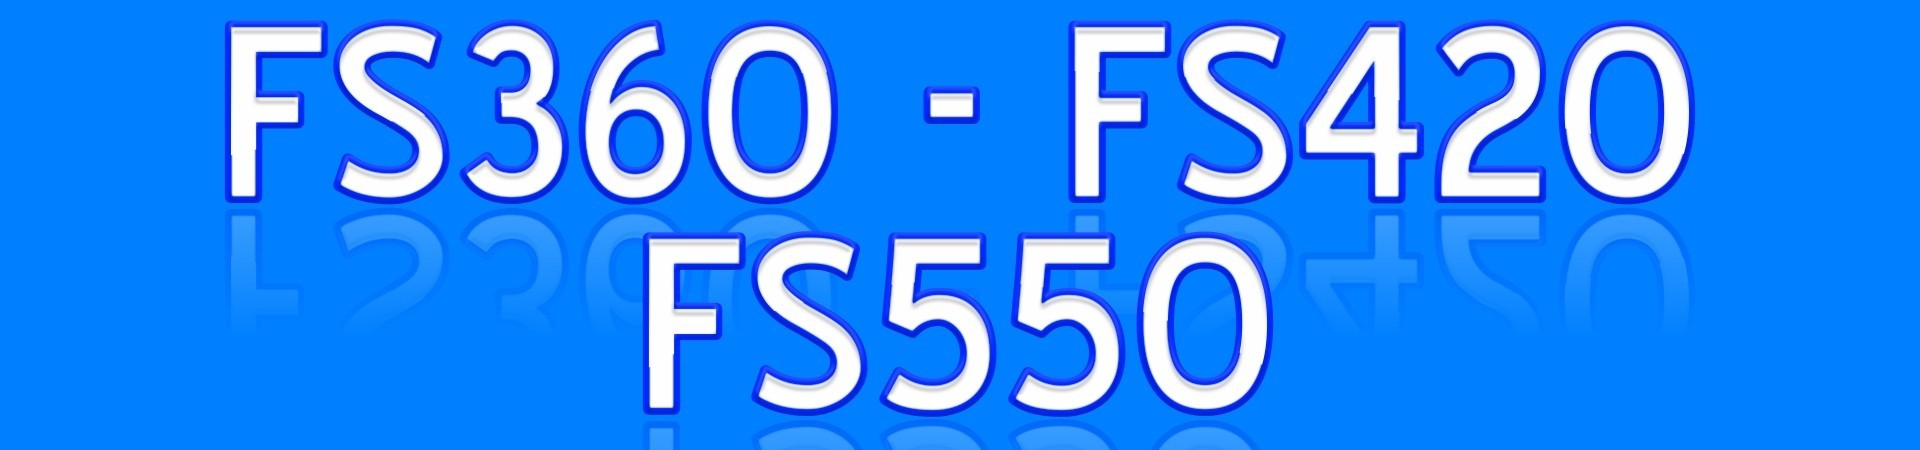 REPUESTOS para Desbrozadora STIHL FS360 FS420 FS550